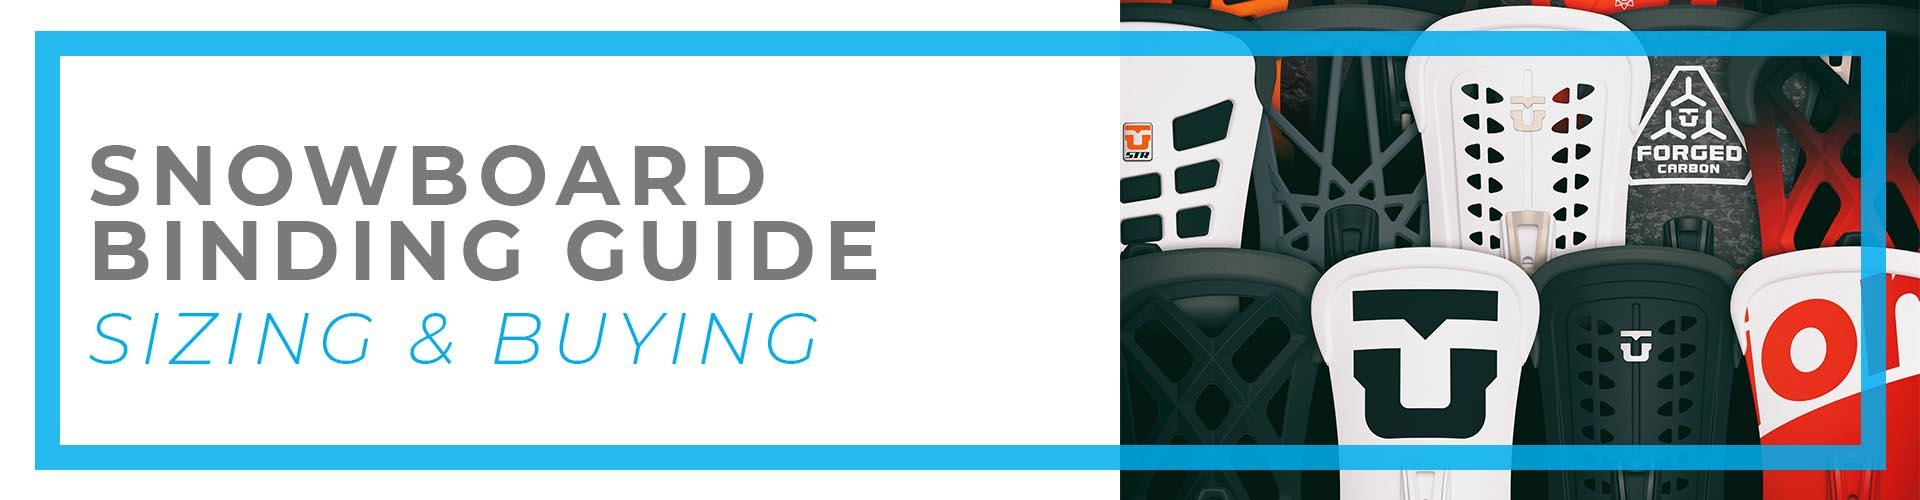 snowboardibinding-buyingguide-banner-1920x500.jpg